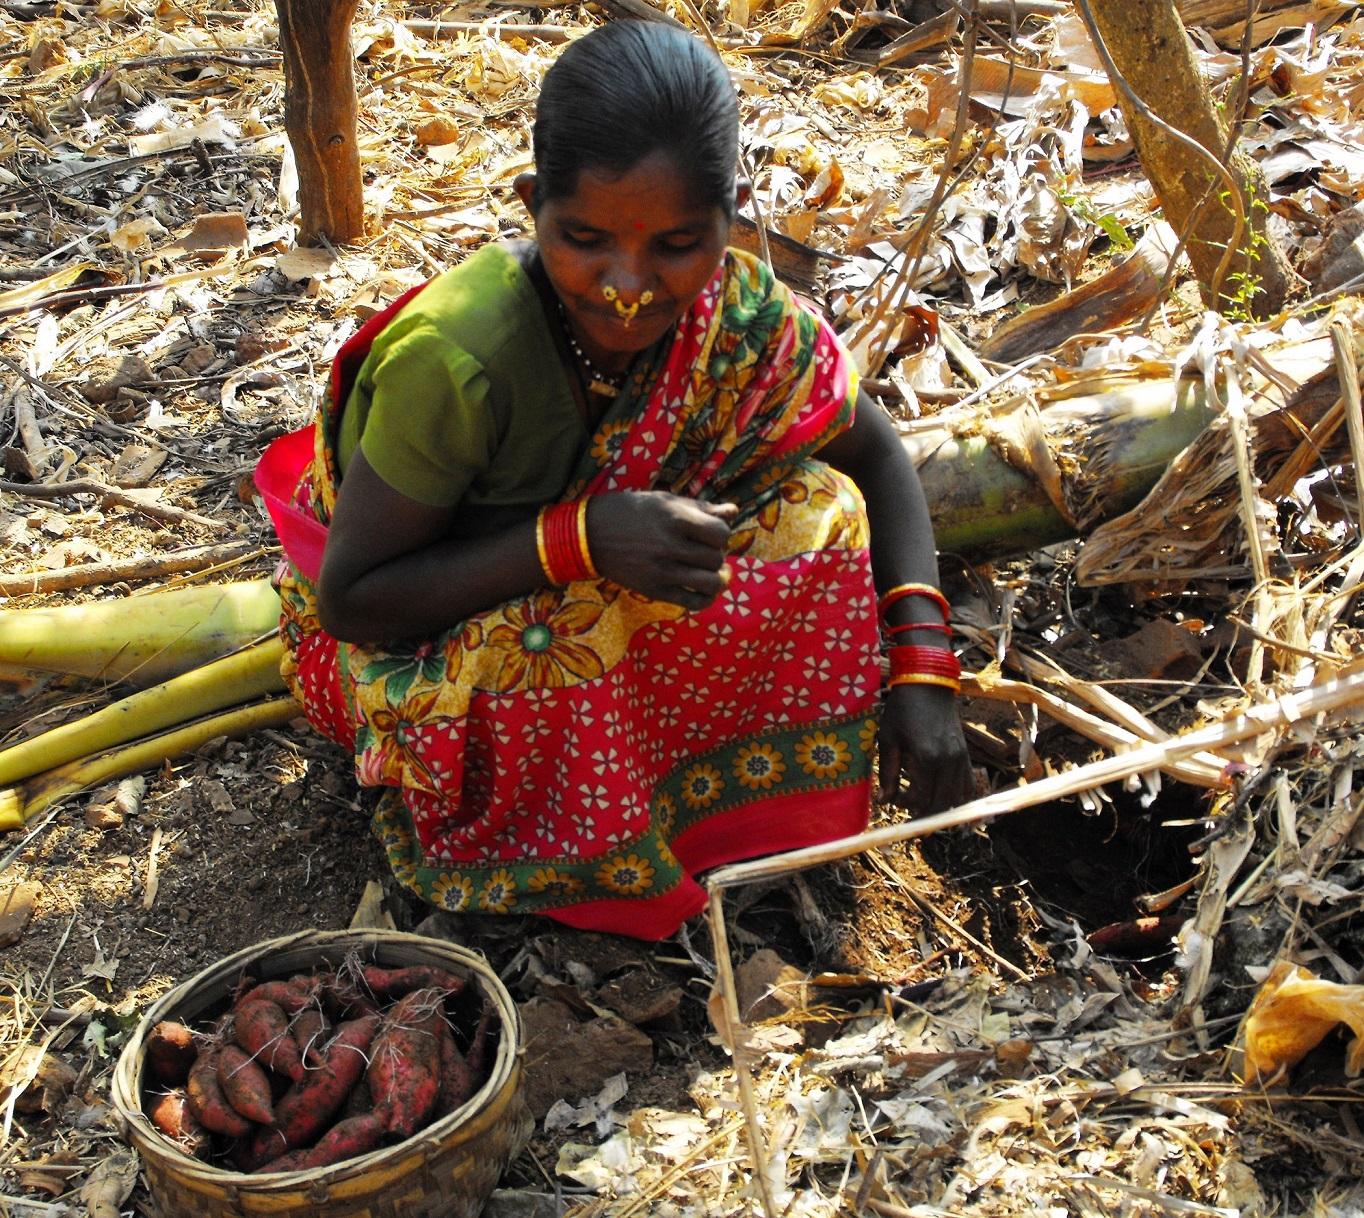 Shobini Muduli is delighted to harvest Sweet Potato